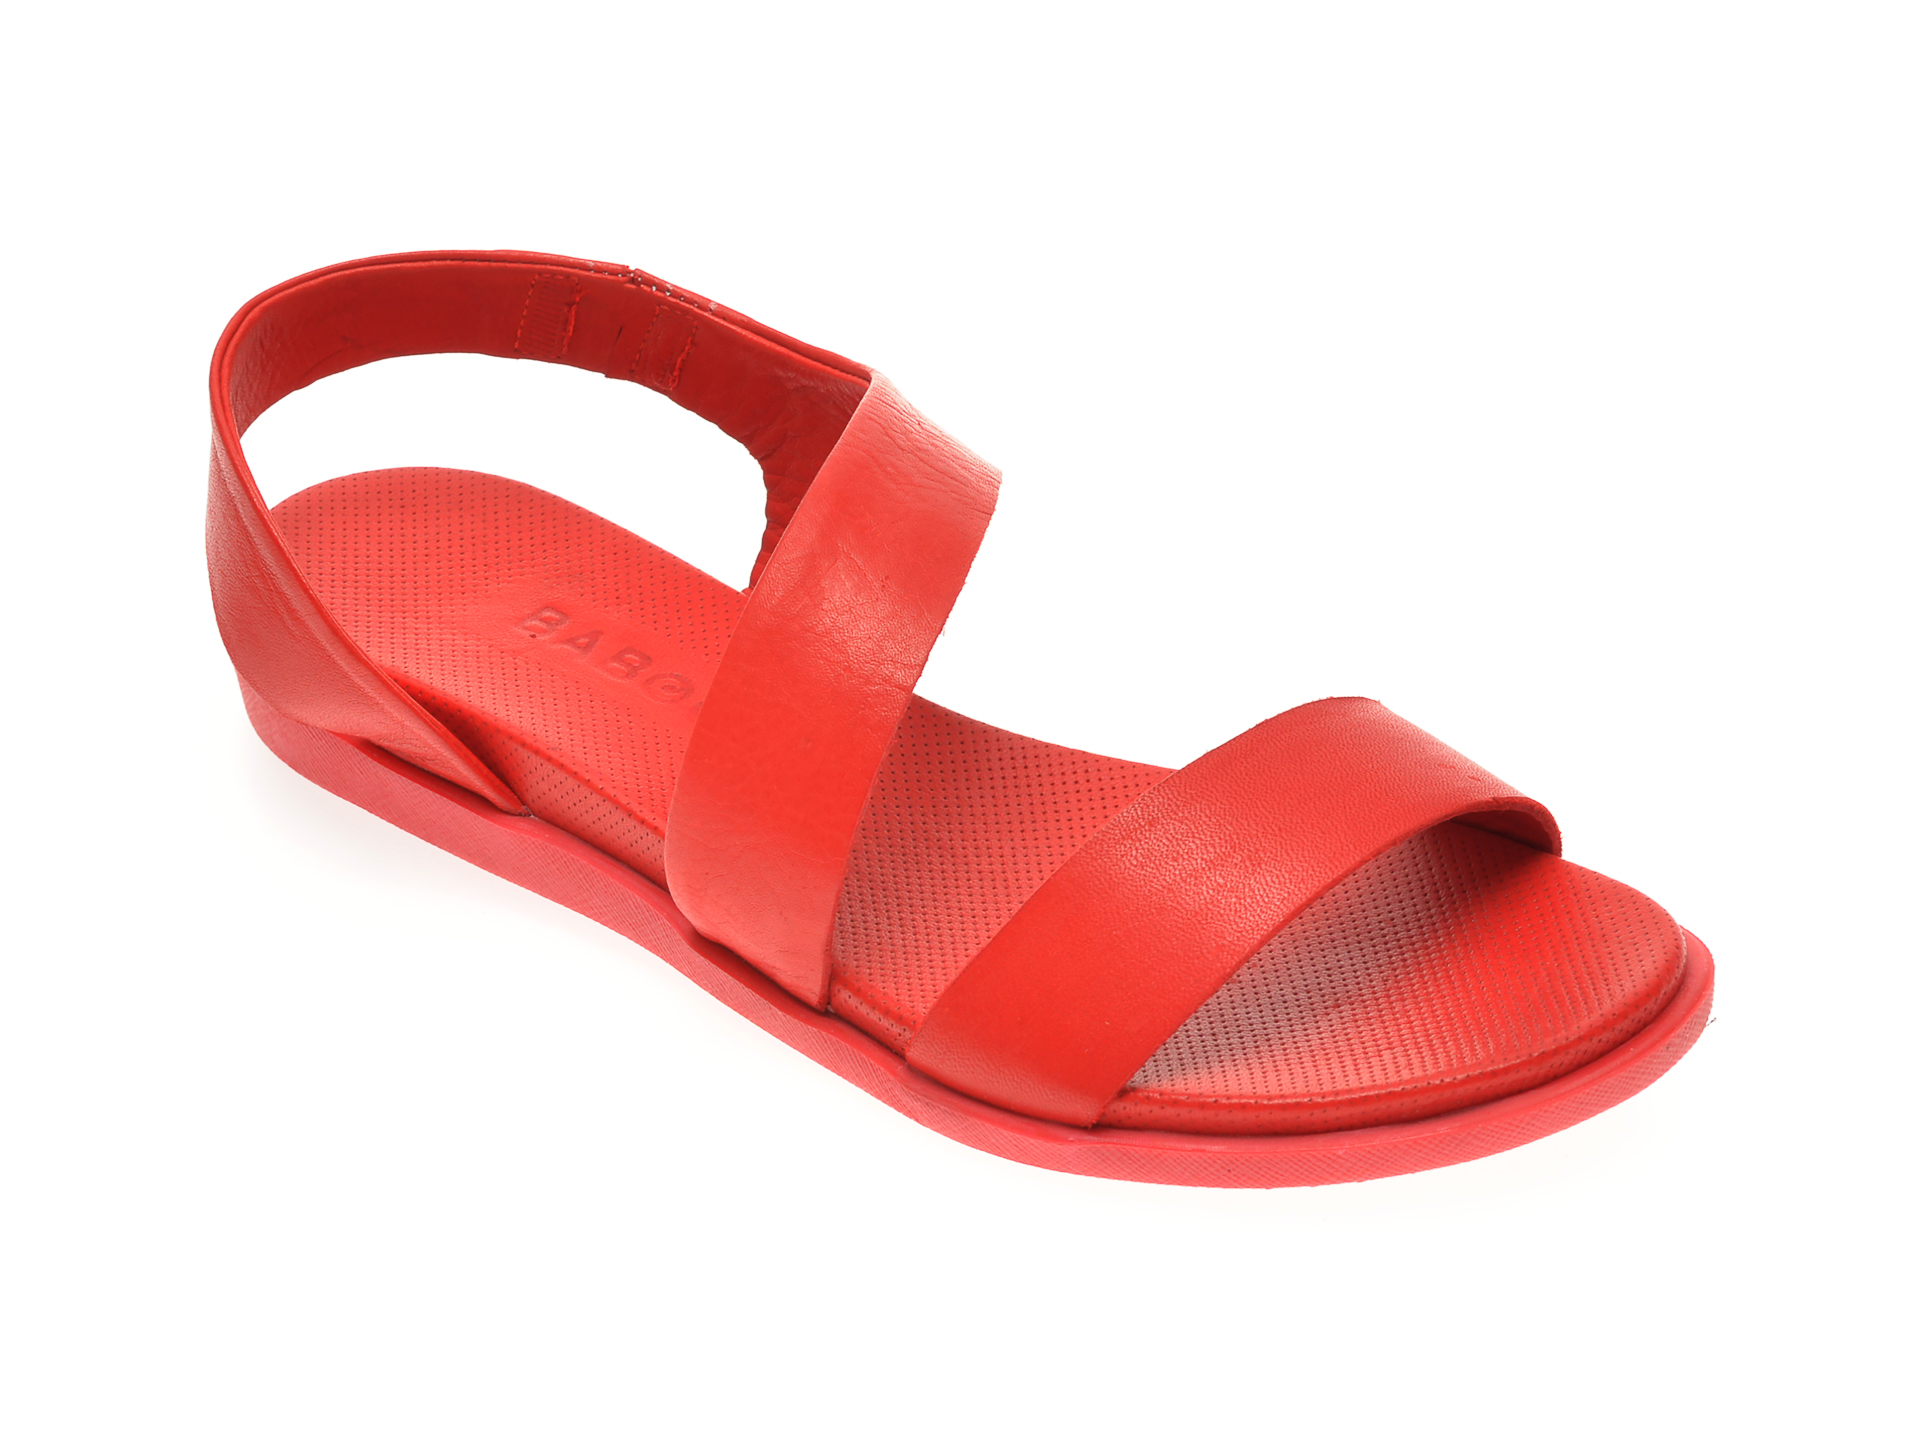 Sandale BABOOS rosii, 1402, din piele naturala imagine